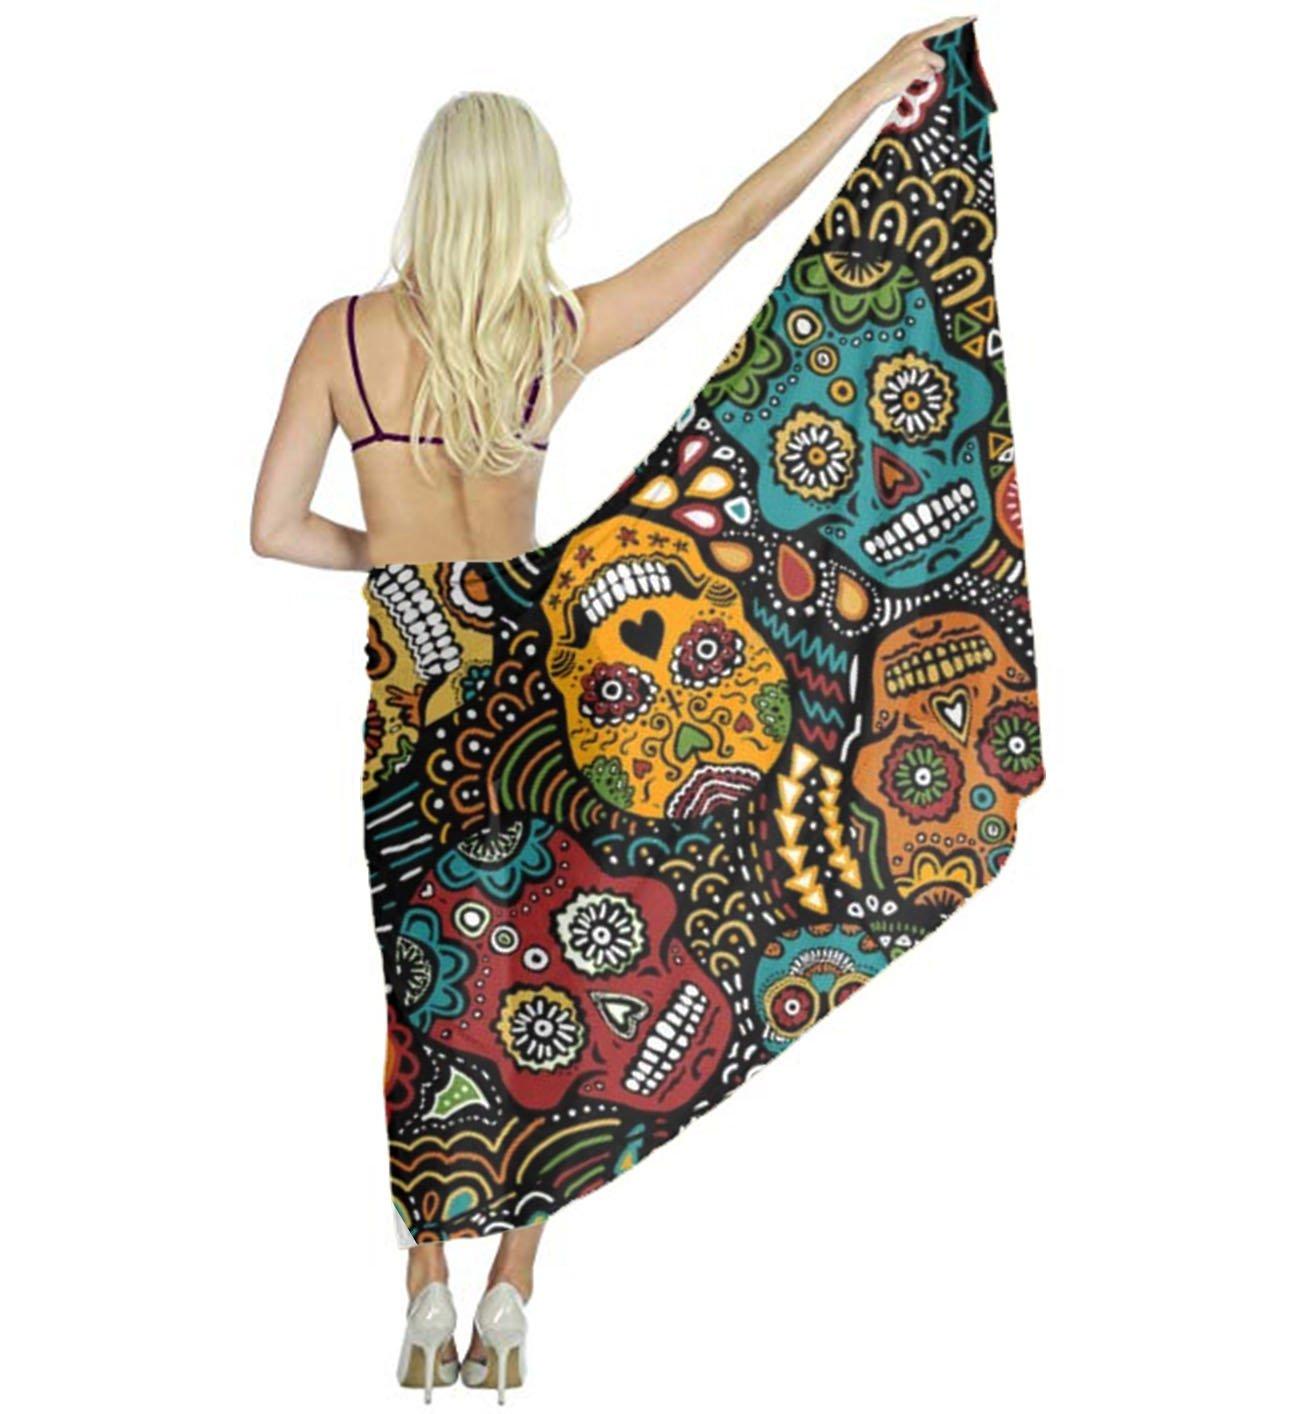 AMERICAN TANG Perfect gift - Swimwear beach scarf cover up for women - Mexican Sugar Skulls Beach Sarong Wrap - Bikini Swimsuit Wrap Chiffon Scarf skirt